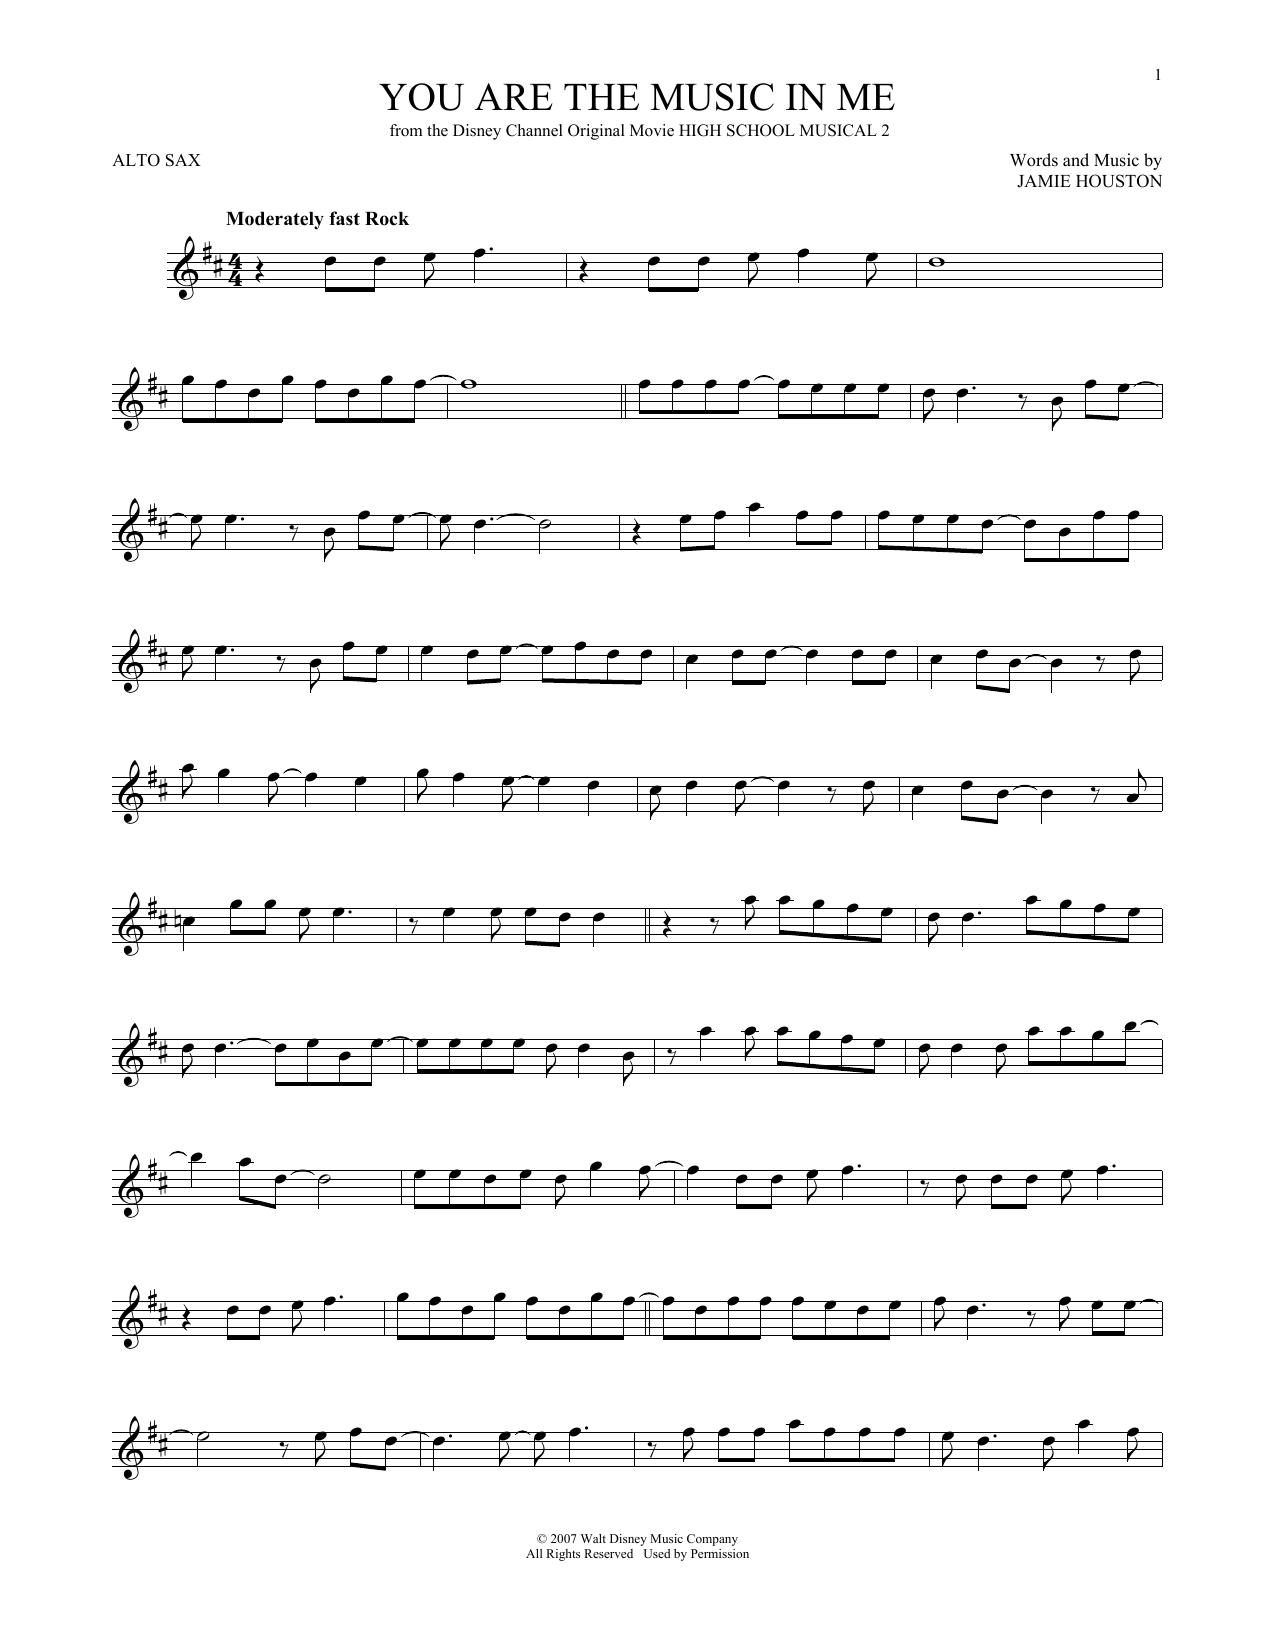 Partition saxophone You Are The Music In Me de Zac Efron and Vanessa Hudgens - Sax Alto